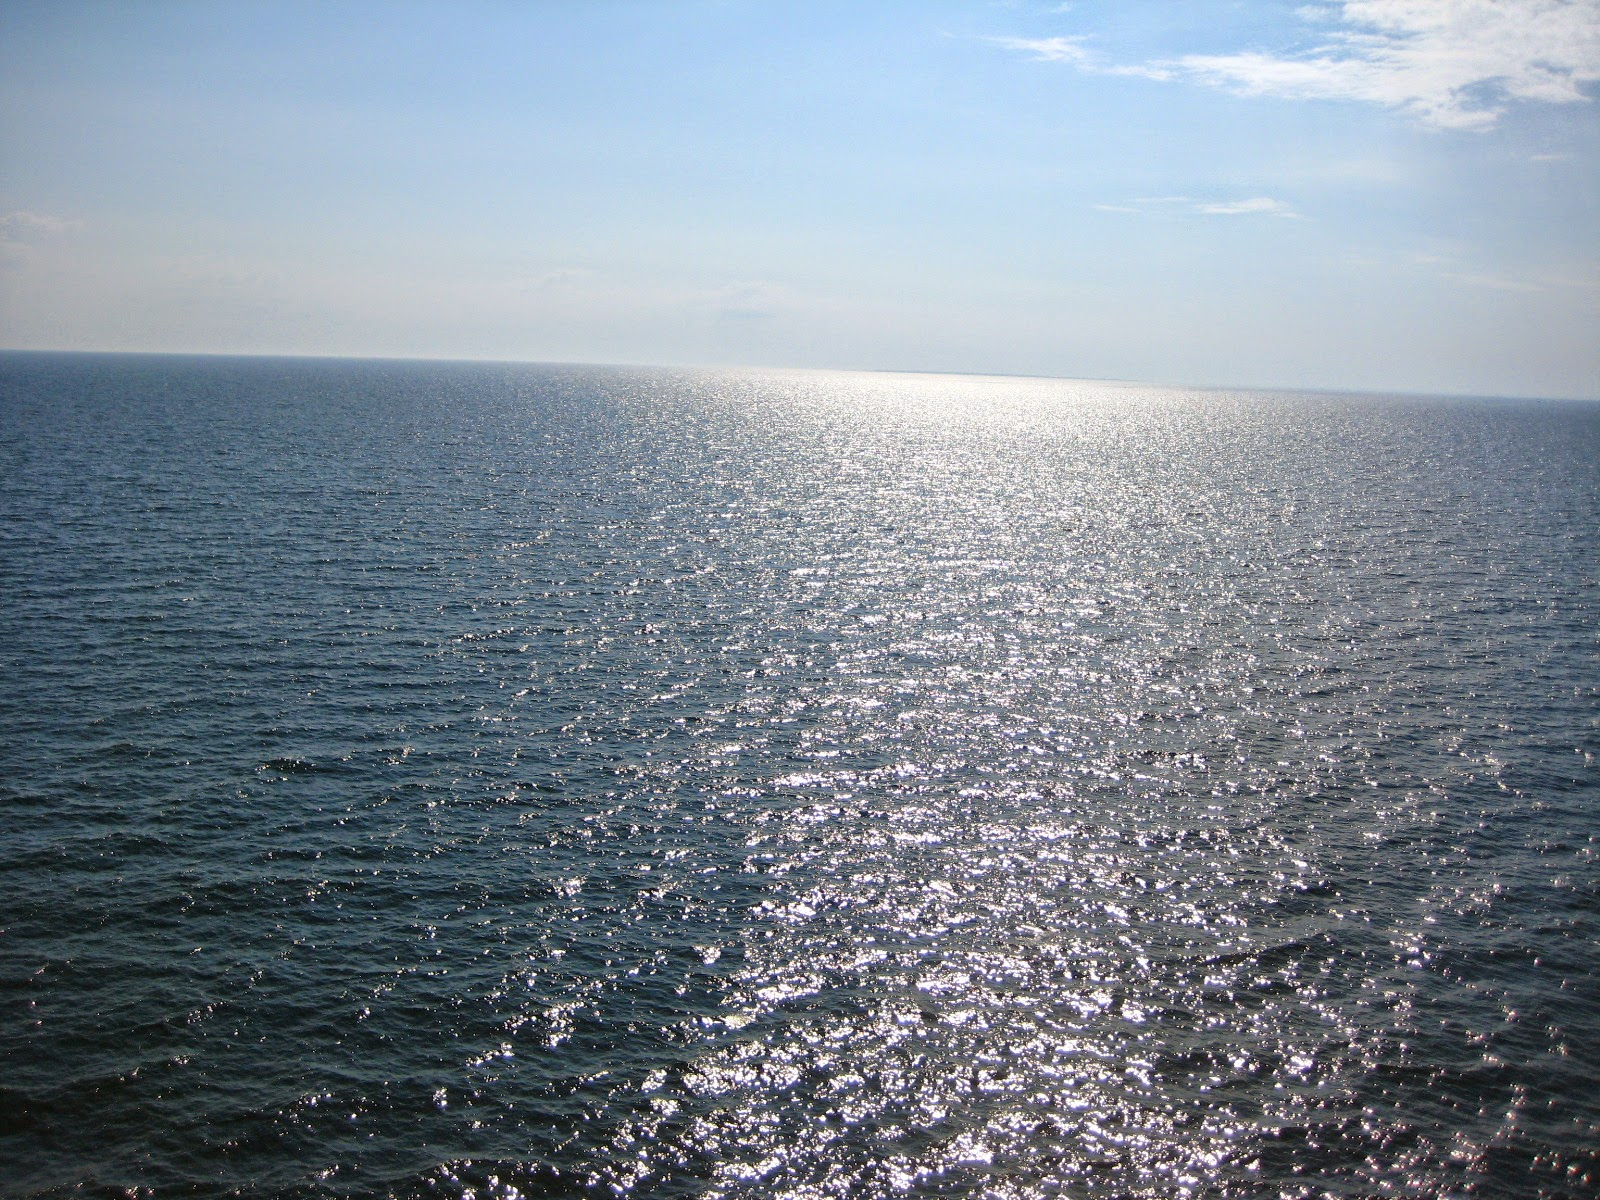 suomenlahti meri